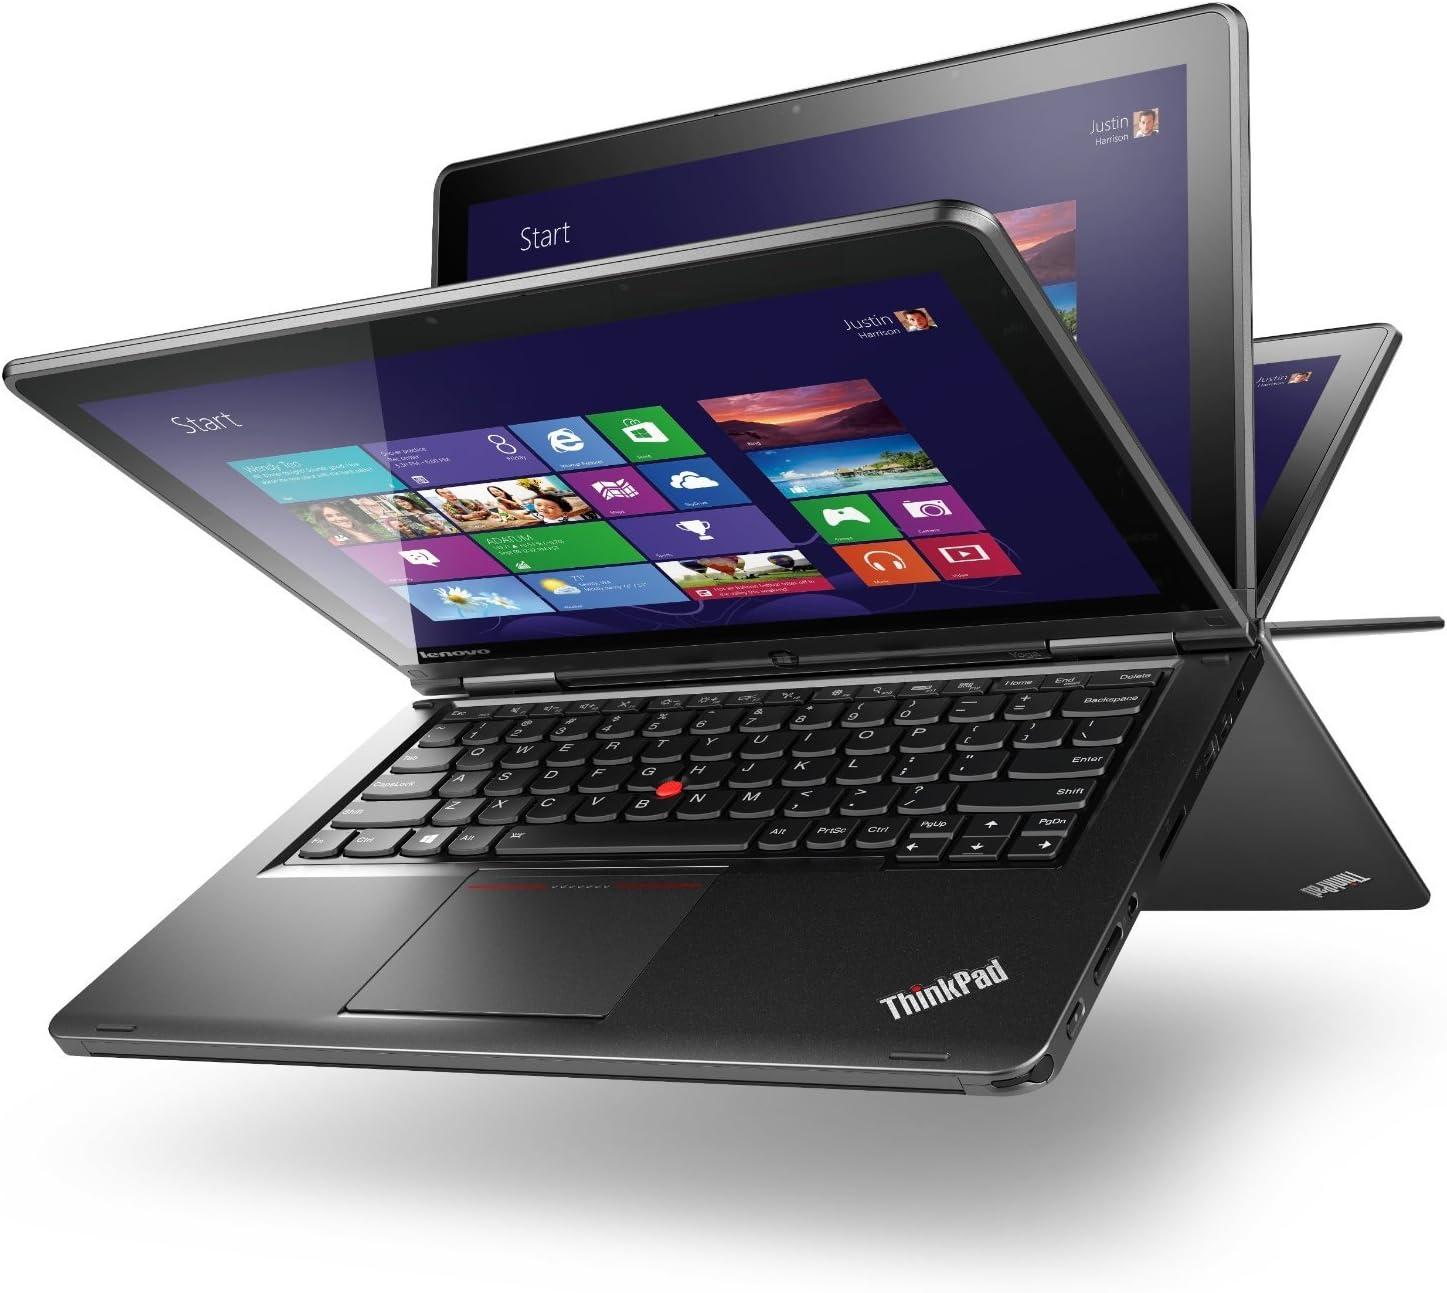 Lenovo Thinkpad S1 Yoga Convertible Touchscreen Ultrabook - Core i5-4300U, 8GB RAM, 180GB Solid State Drive, Windows 8.1 Professional, WiFi AC, 8 Cell Battery